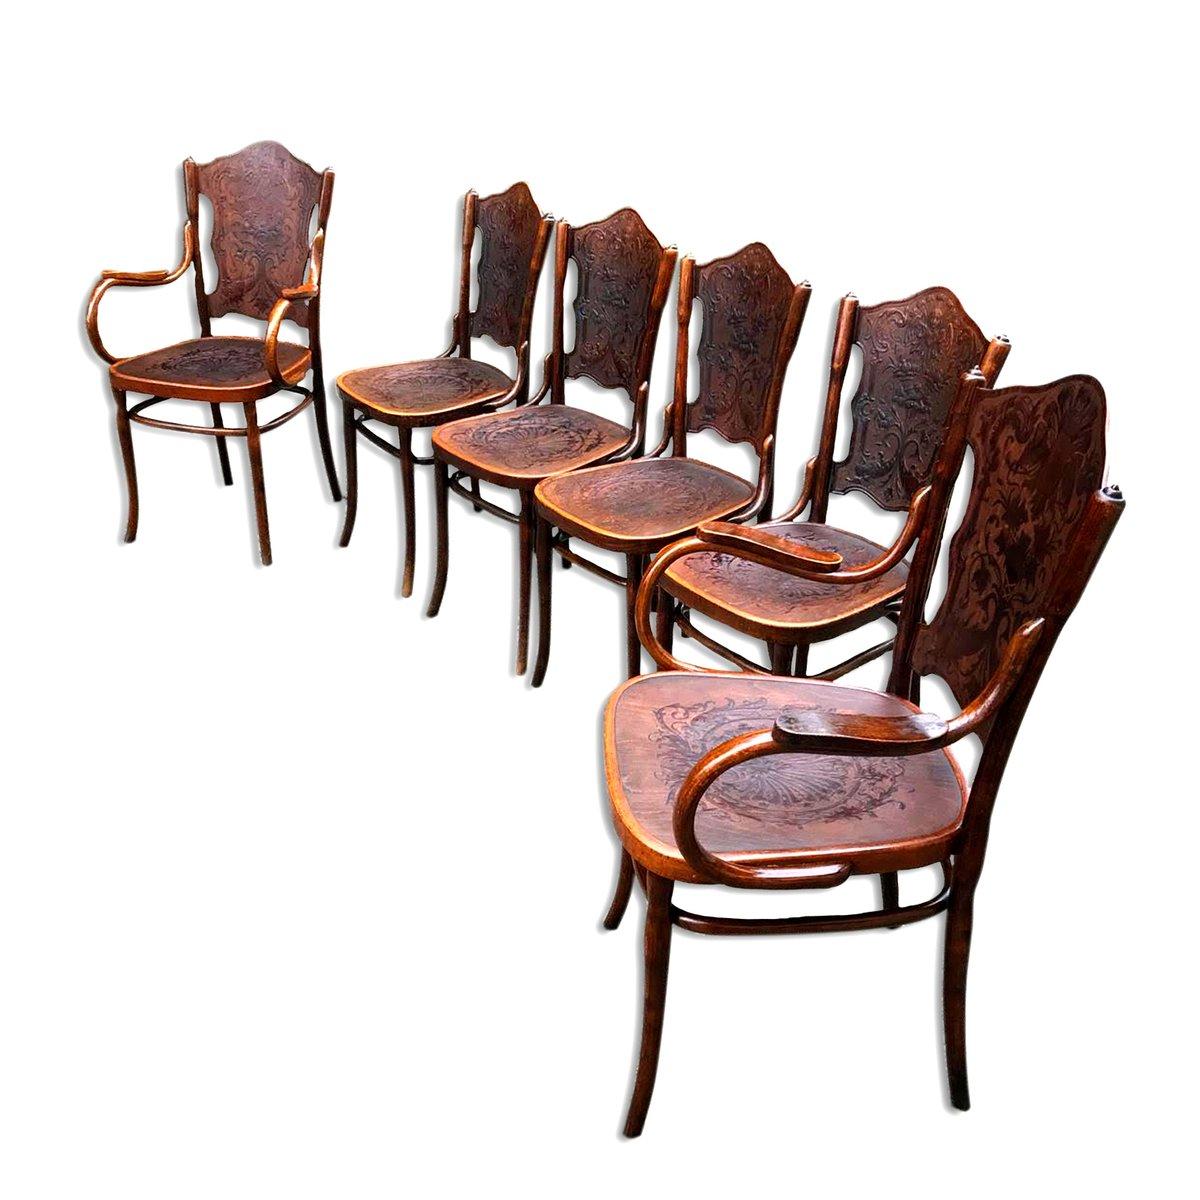 antike st hle sessel aus bugholz von jacob josef kohn bei pamono kaufen. Black Bedroom Furniture Sets. Home Design Ideas